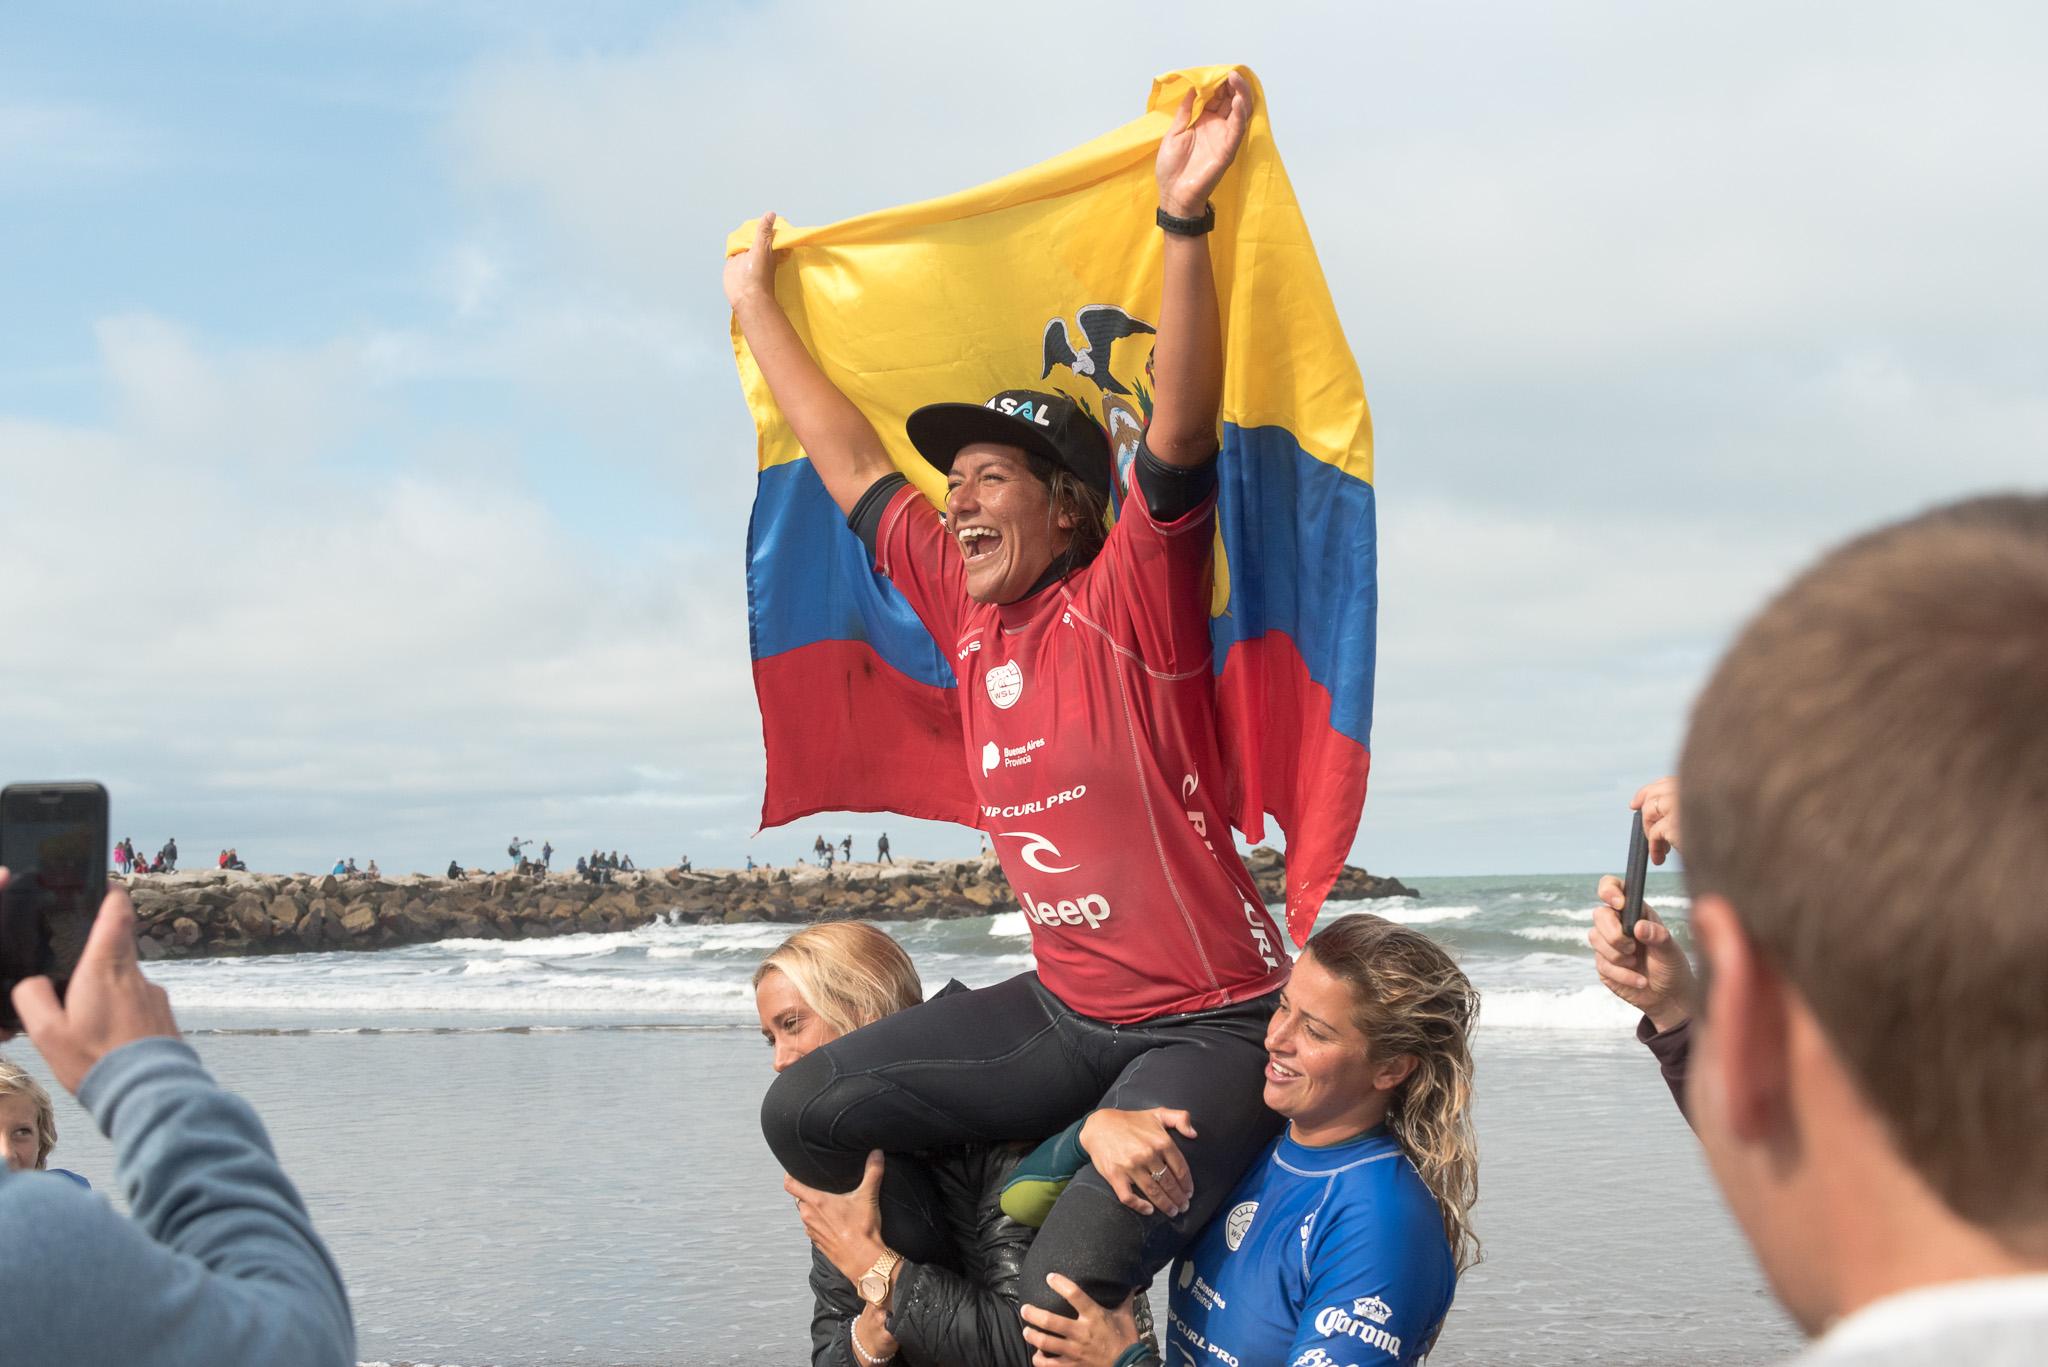 Dominic Barona (EQU) (Beto Oviedo / Surfing Latino)